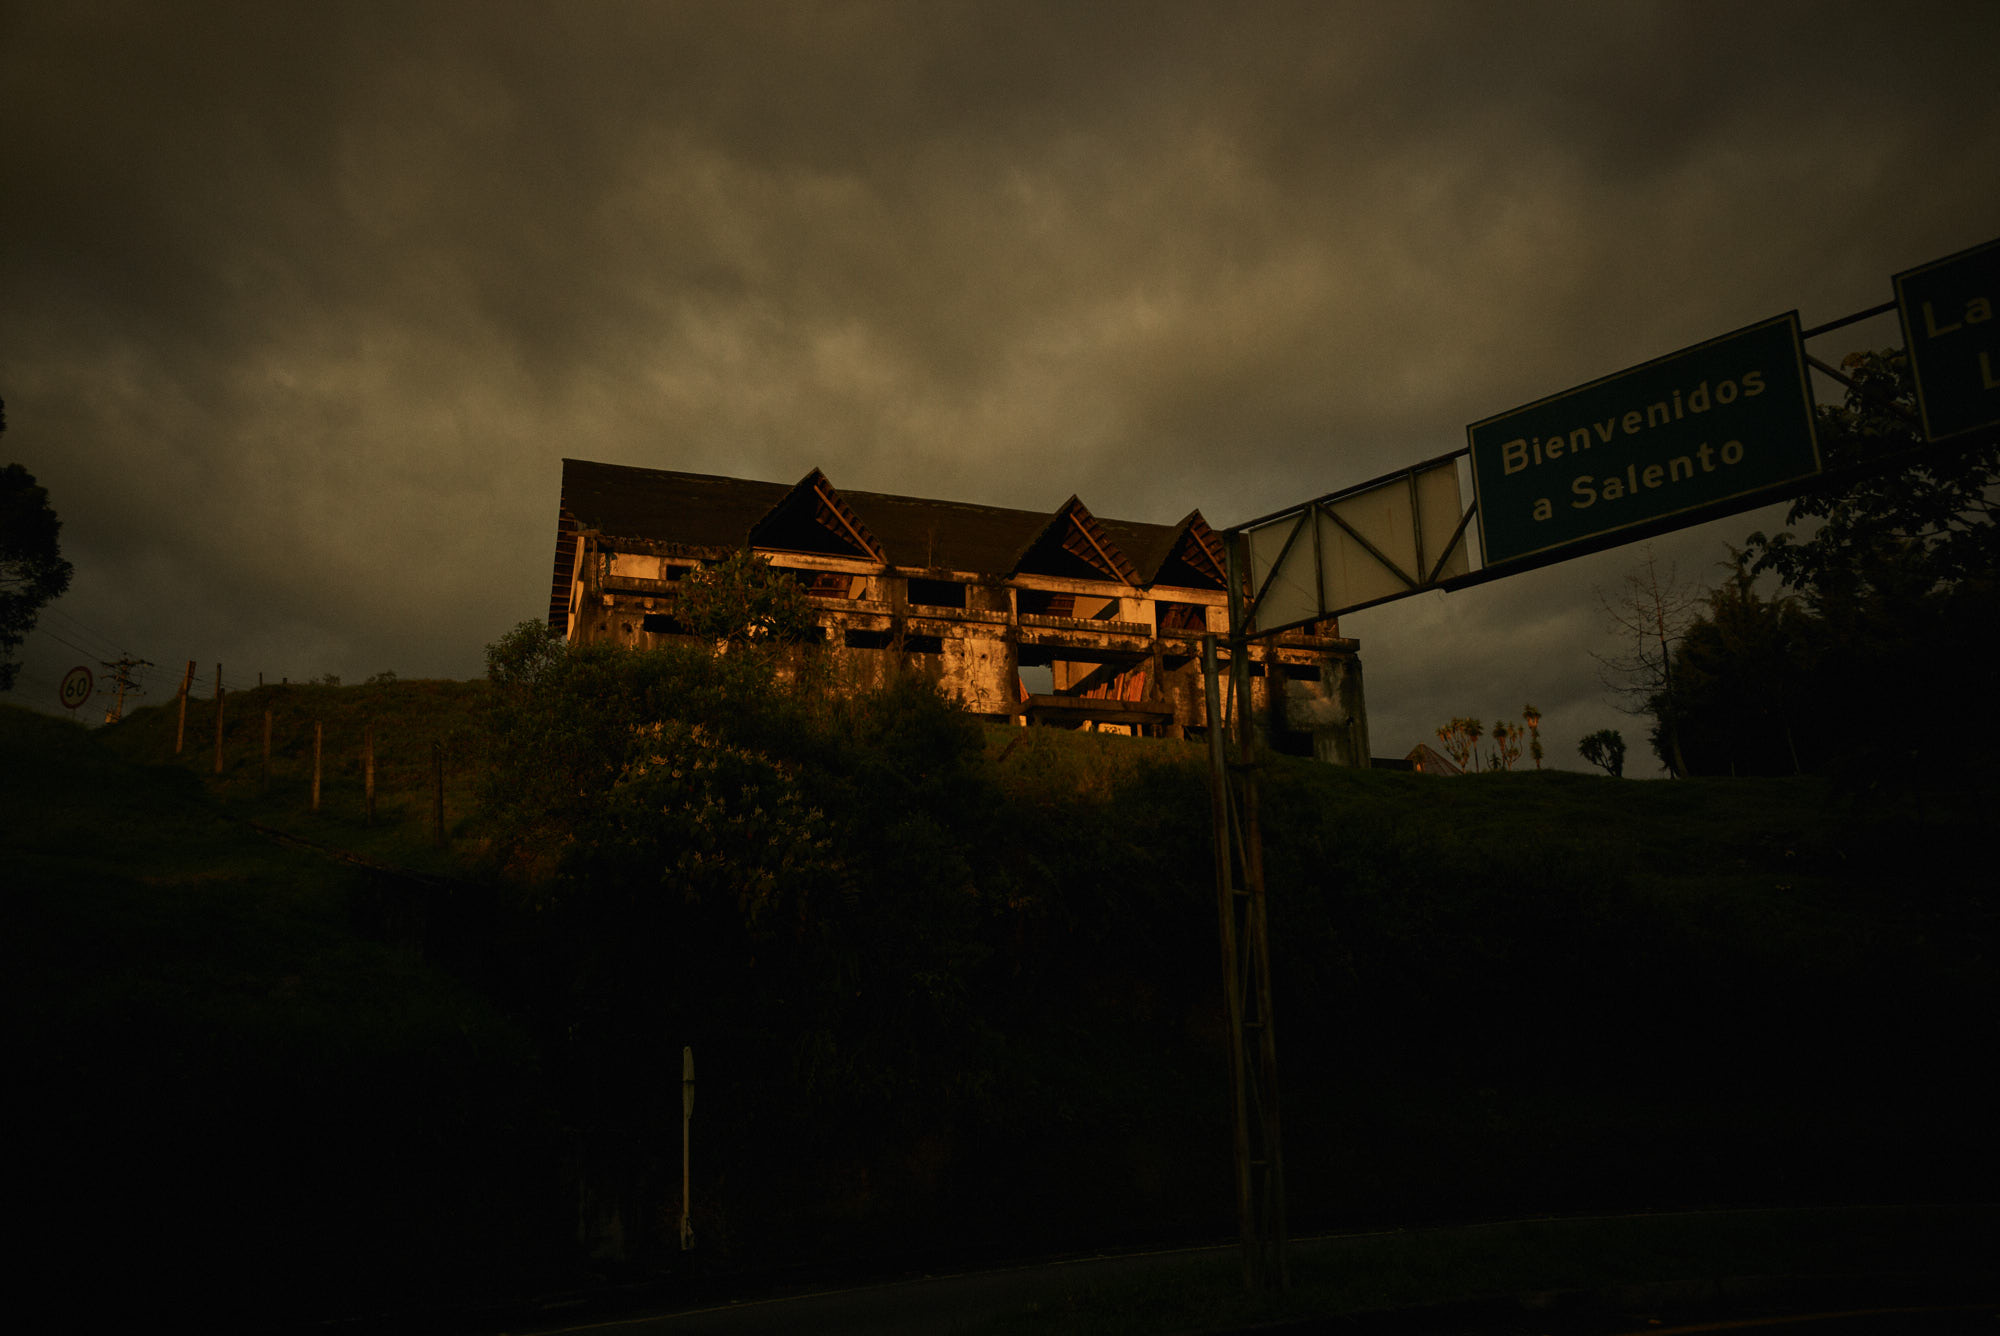 LOWRES-RADRACE-COLUMBIA-2018-CARLOS-2727.jpg